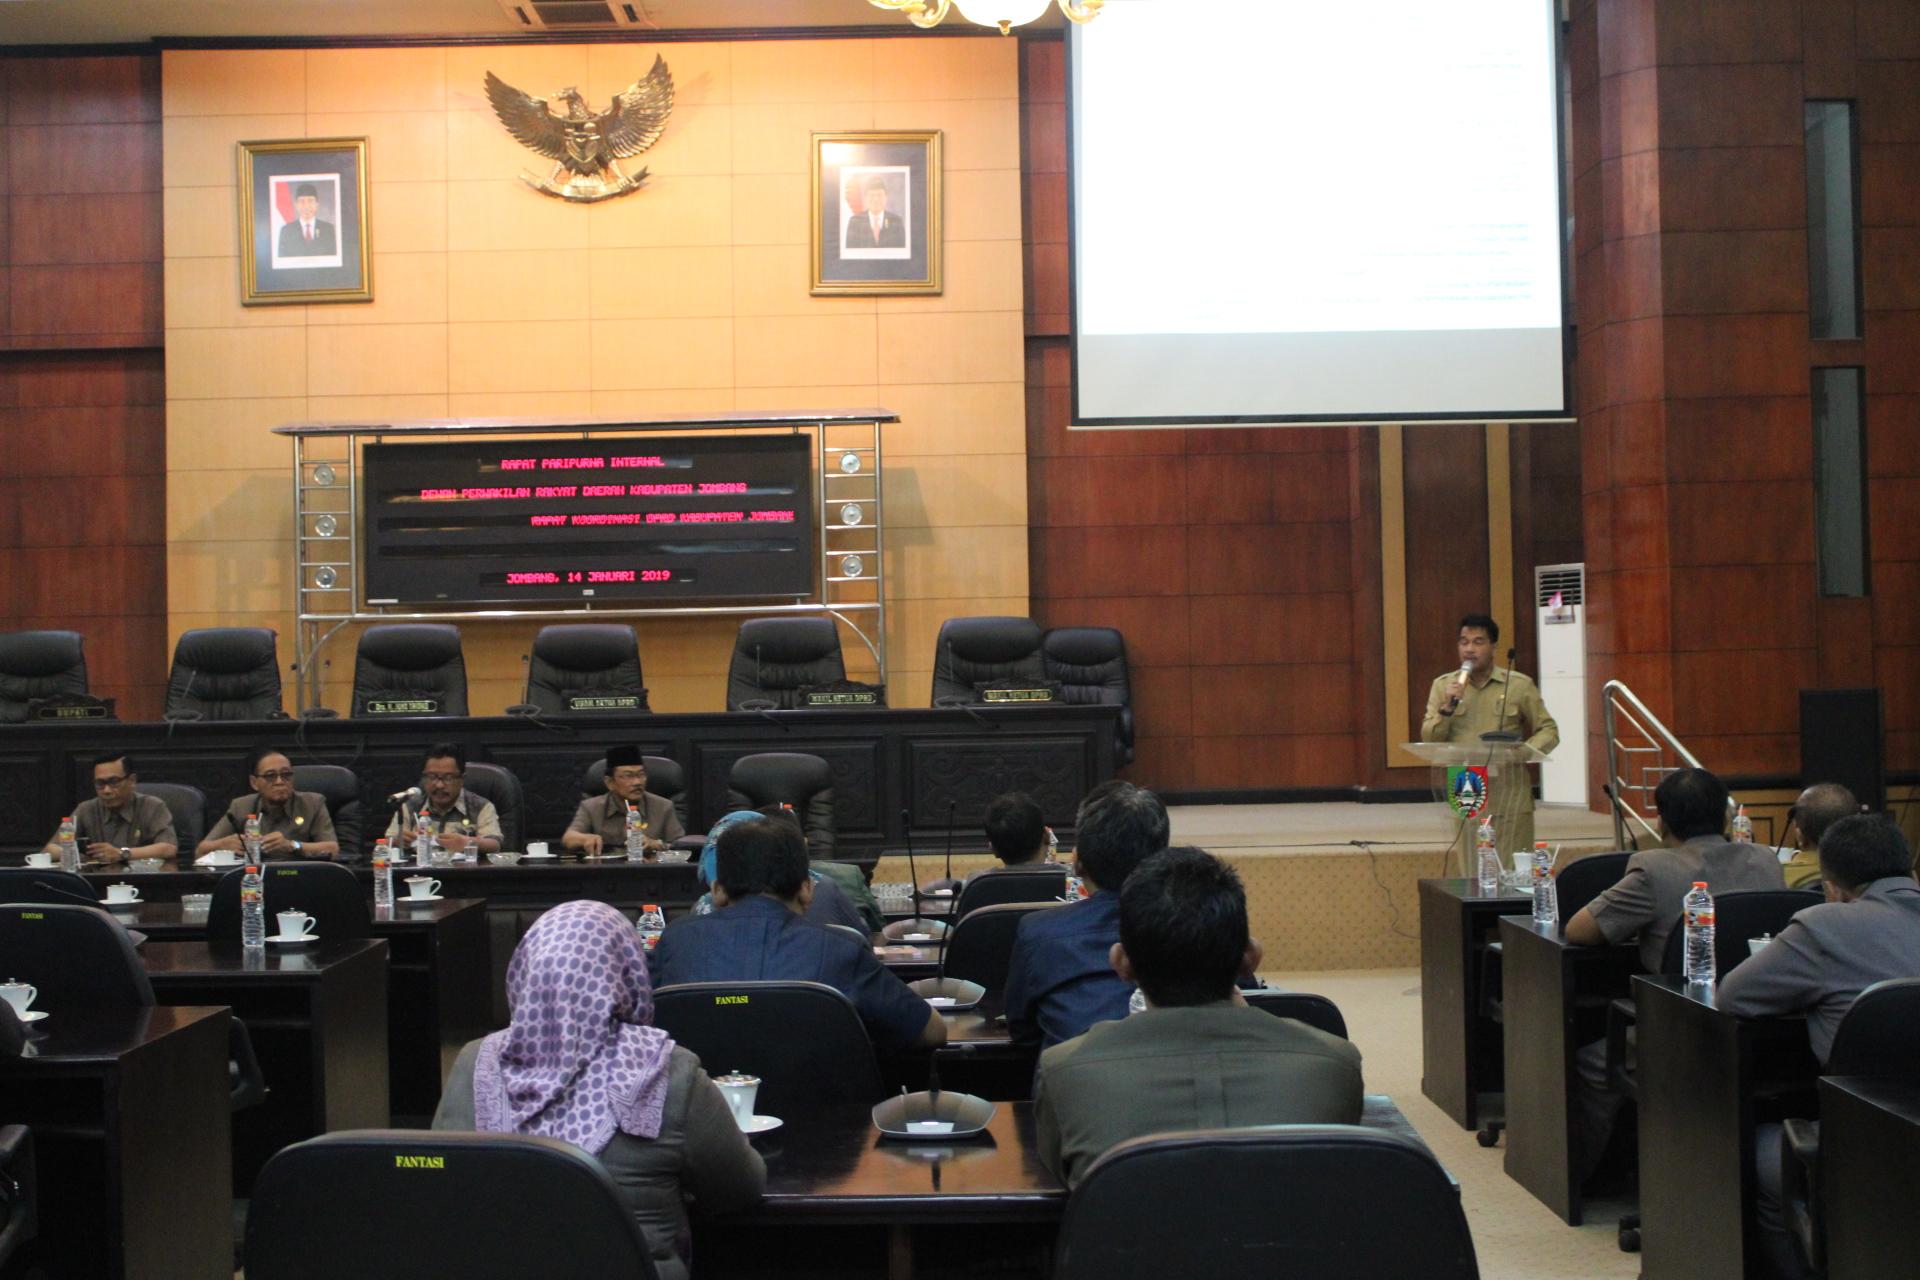 Kepala Bappeda Kabupaten Jombang Eksan Gunajati saat memaparkan soal pokok pikiran anggota DPRD di ruang paripurna DPRD Jombang. (Foto : Adi Rosul / JombangTIMES)